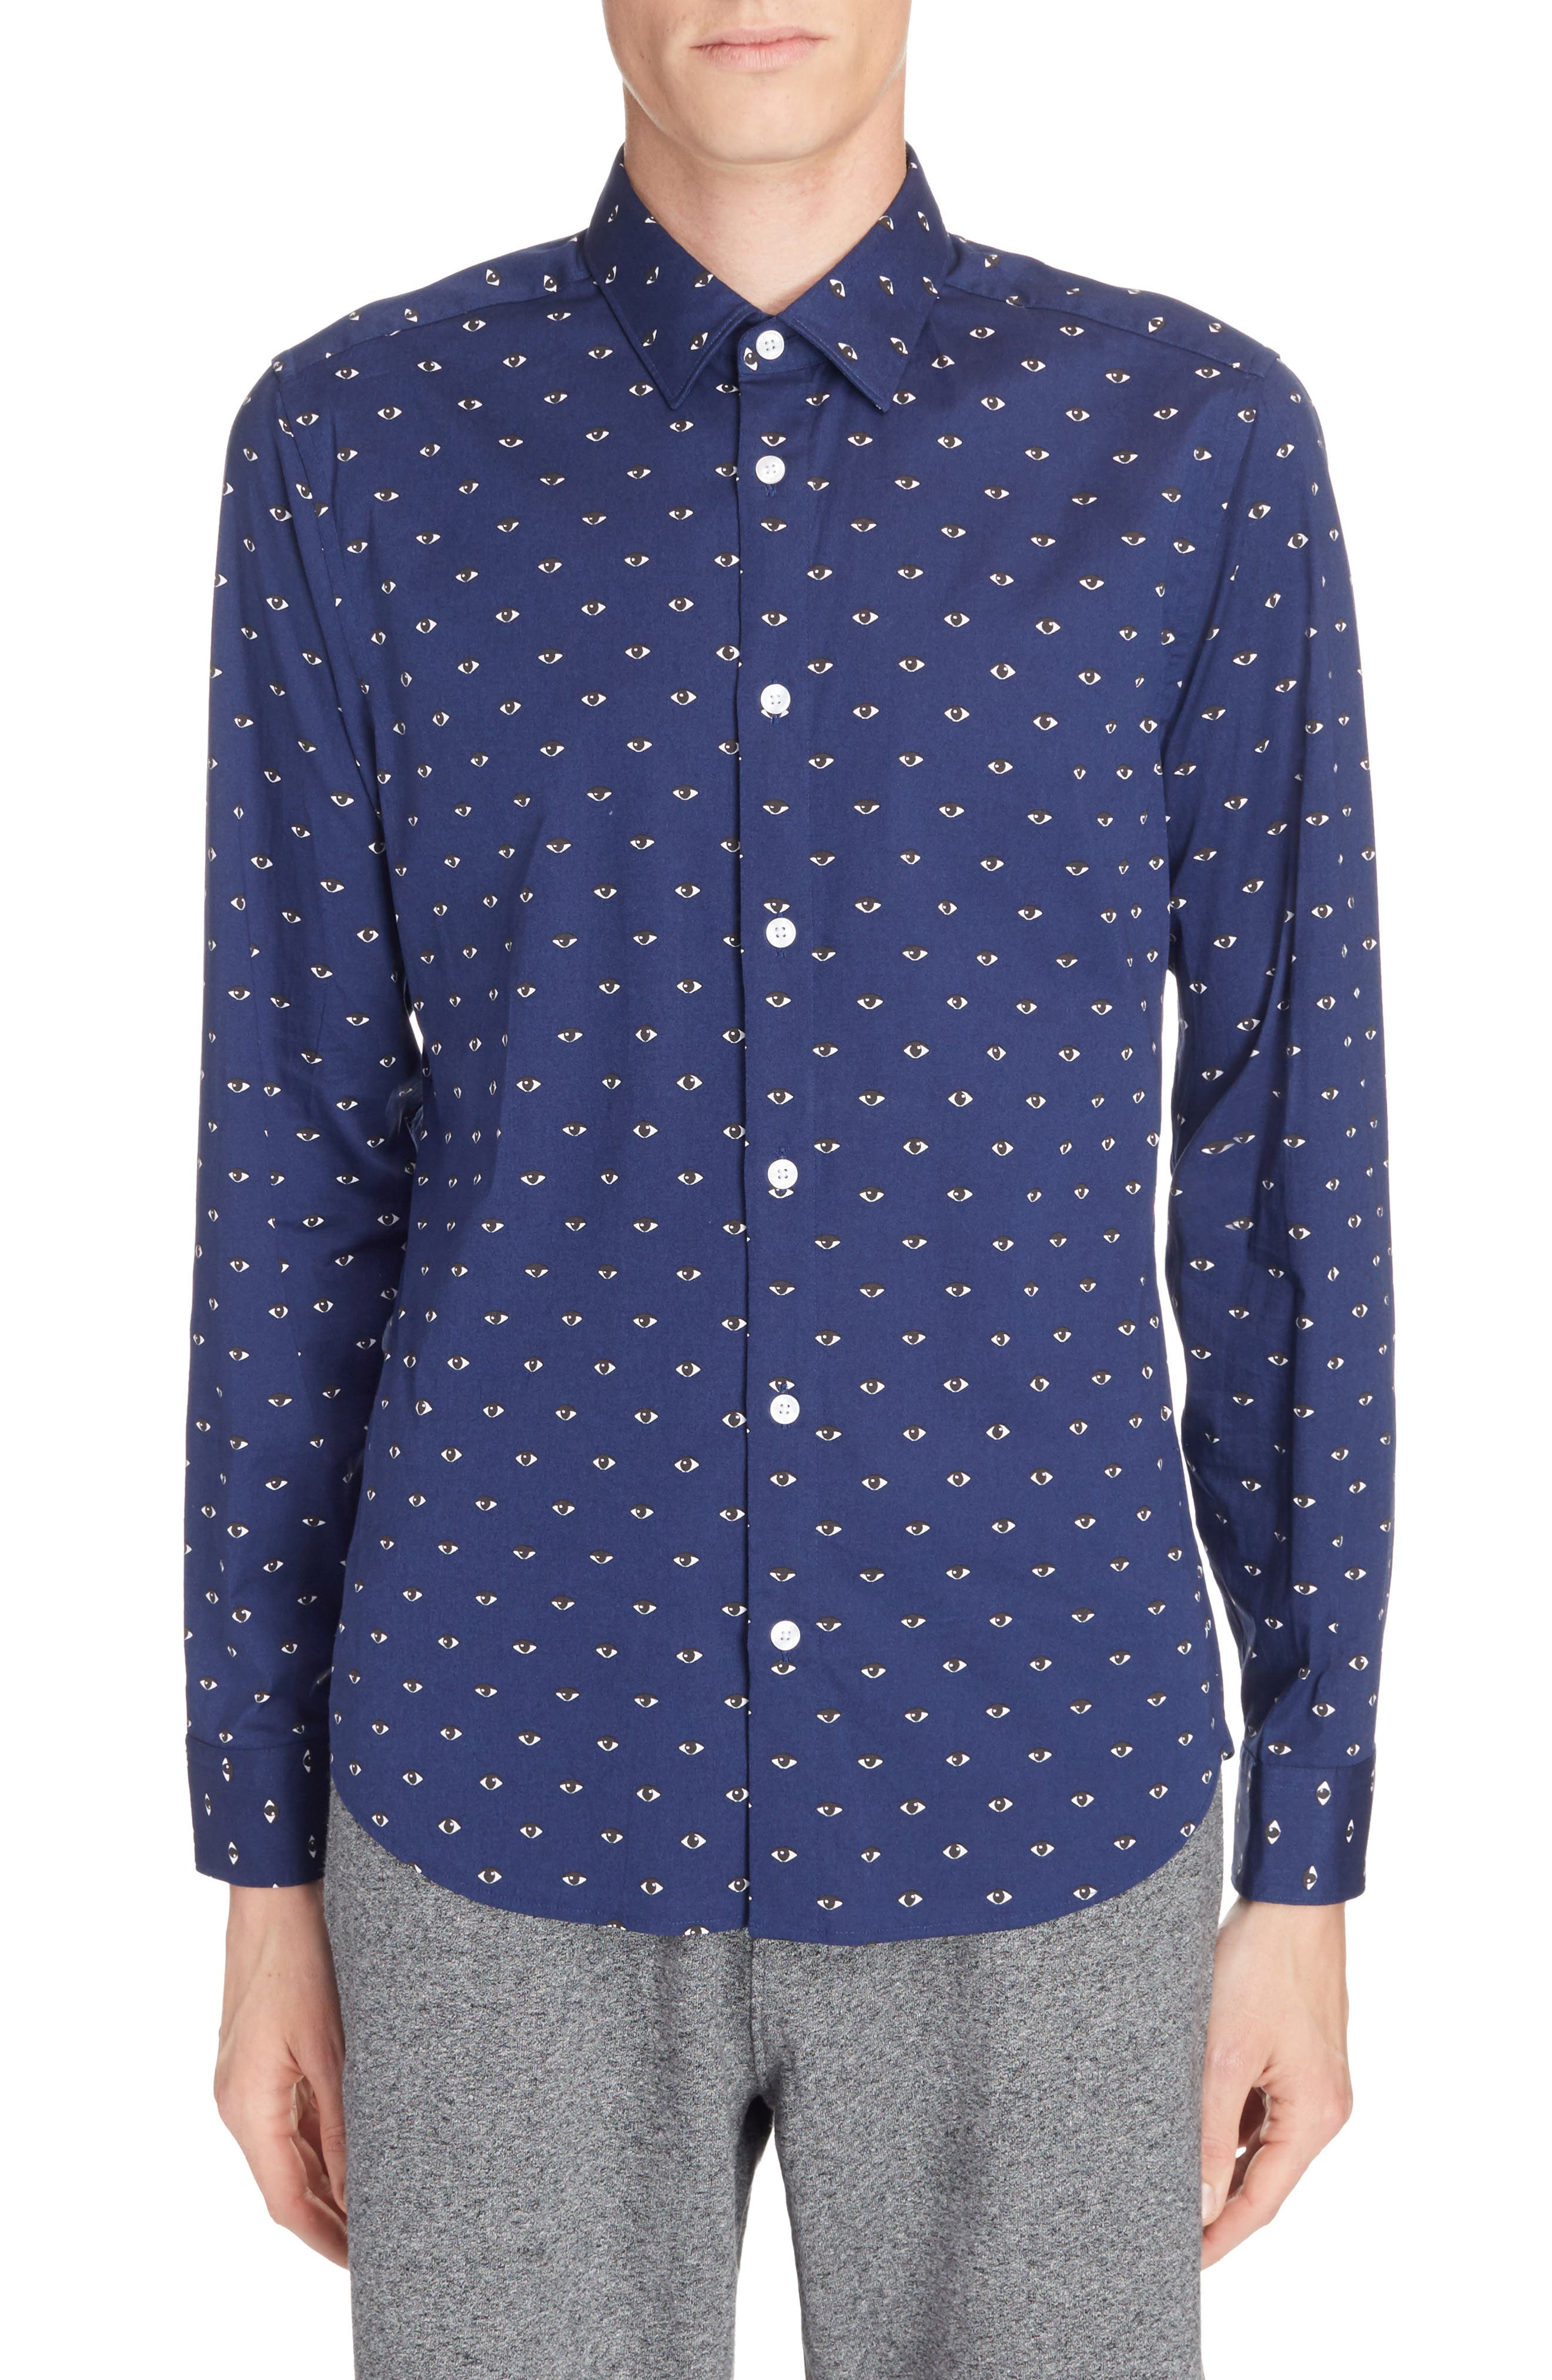 Allover Eye Print Woven Shirt,                             Main thumbnail 1, color,                             Navy Blue